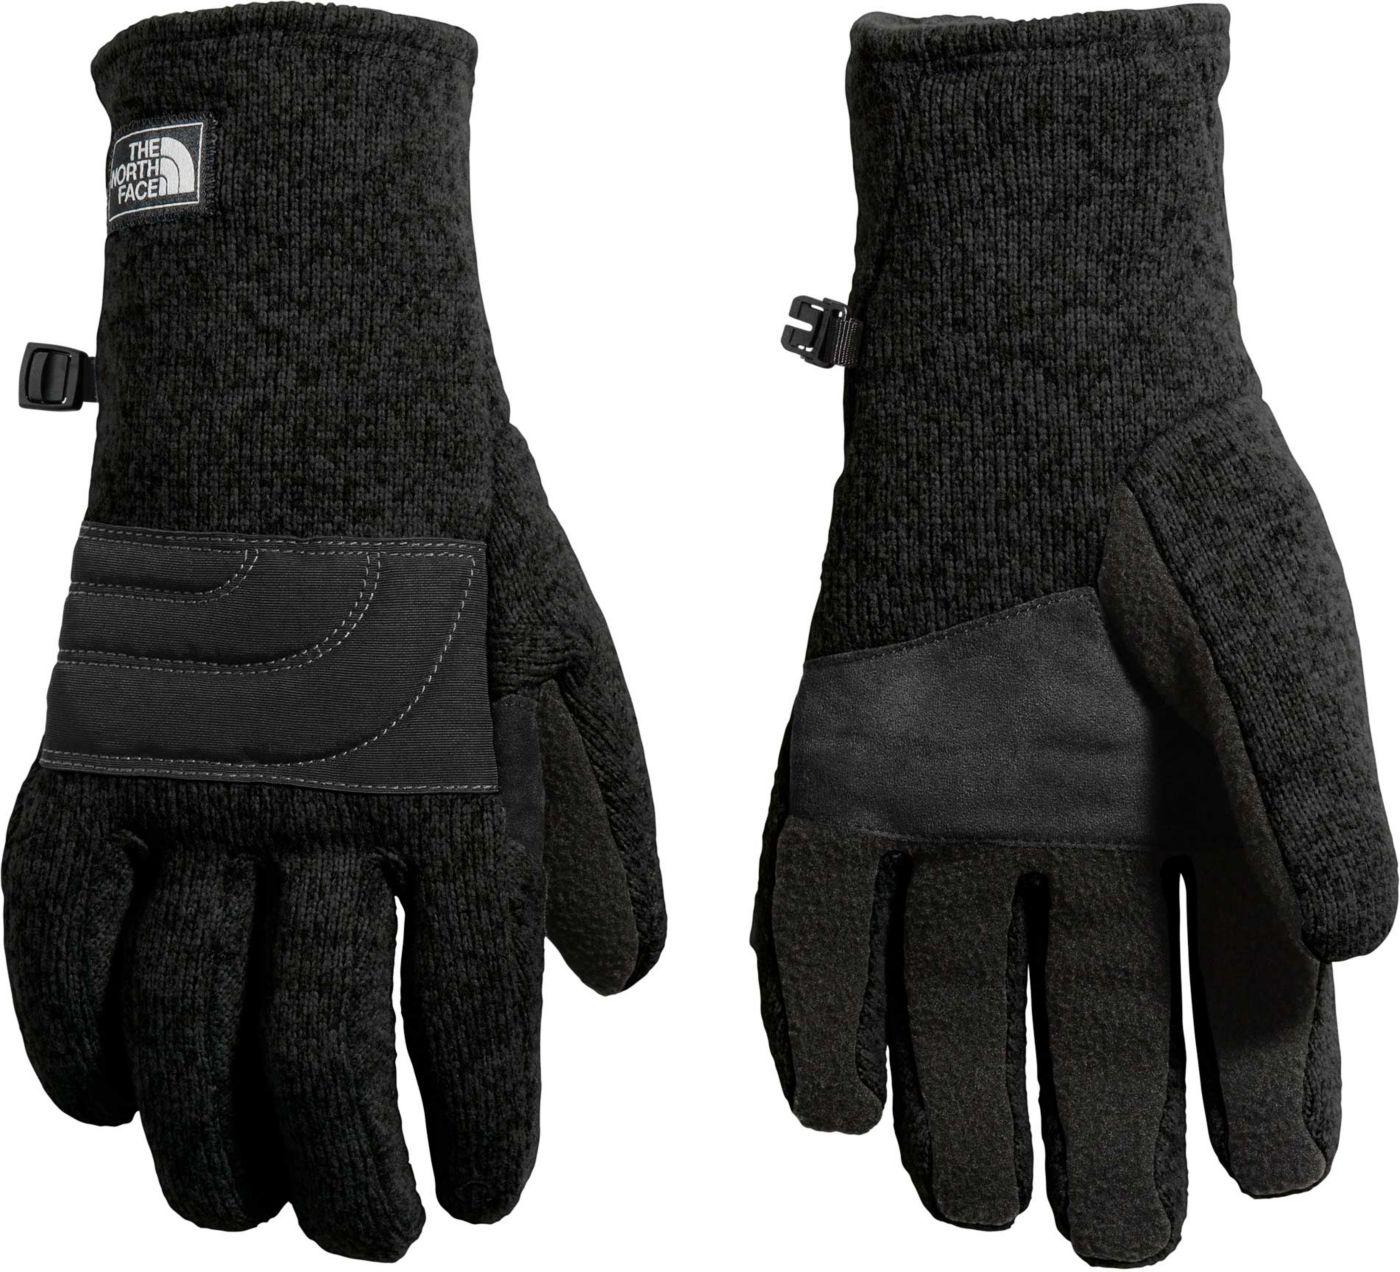 The North Face Men's Gordon Lyons Tech Gloves